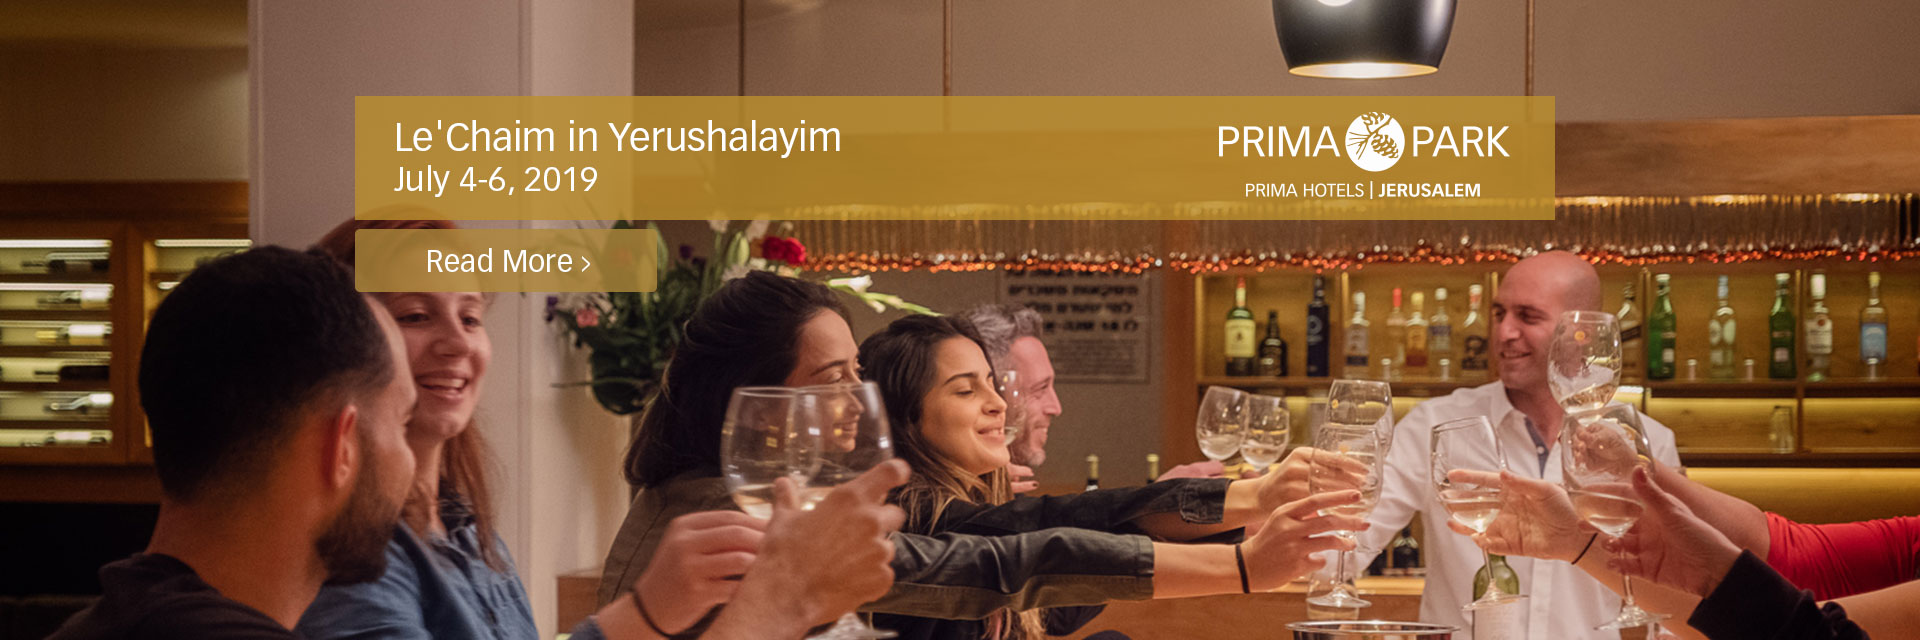 LeChaim in Yerushalayim Weekend